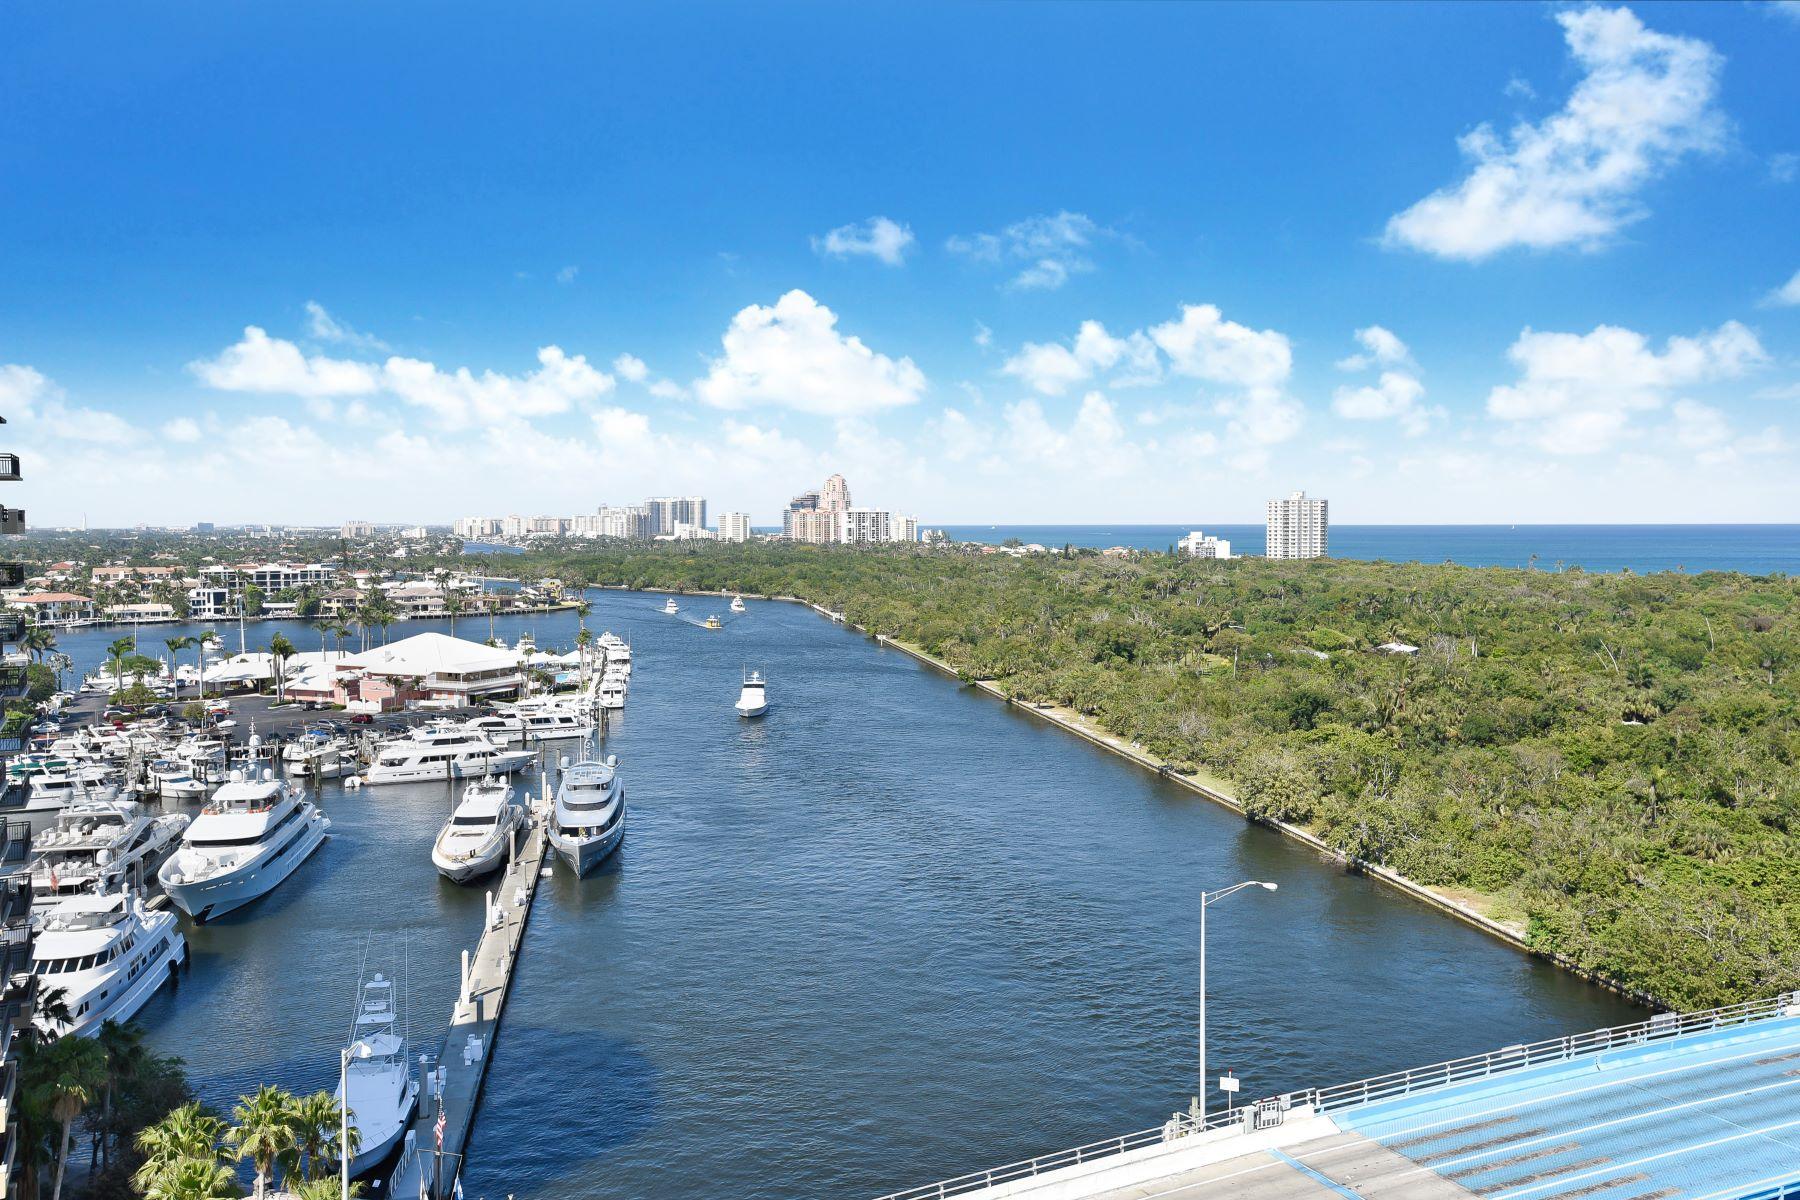 共管物業 為 出售 在 2670 E Sunrise Blvd 2670 E Sunrise Blvd PH1428, Fort Lauderdale, 佛羅里達州, 33304 美國